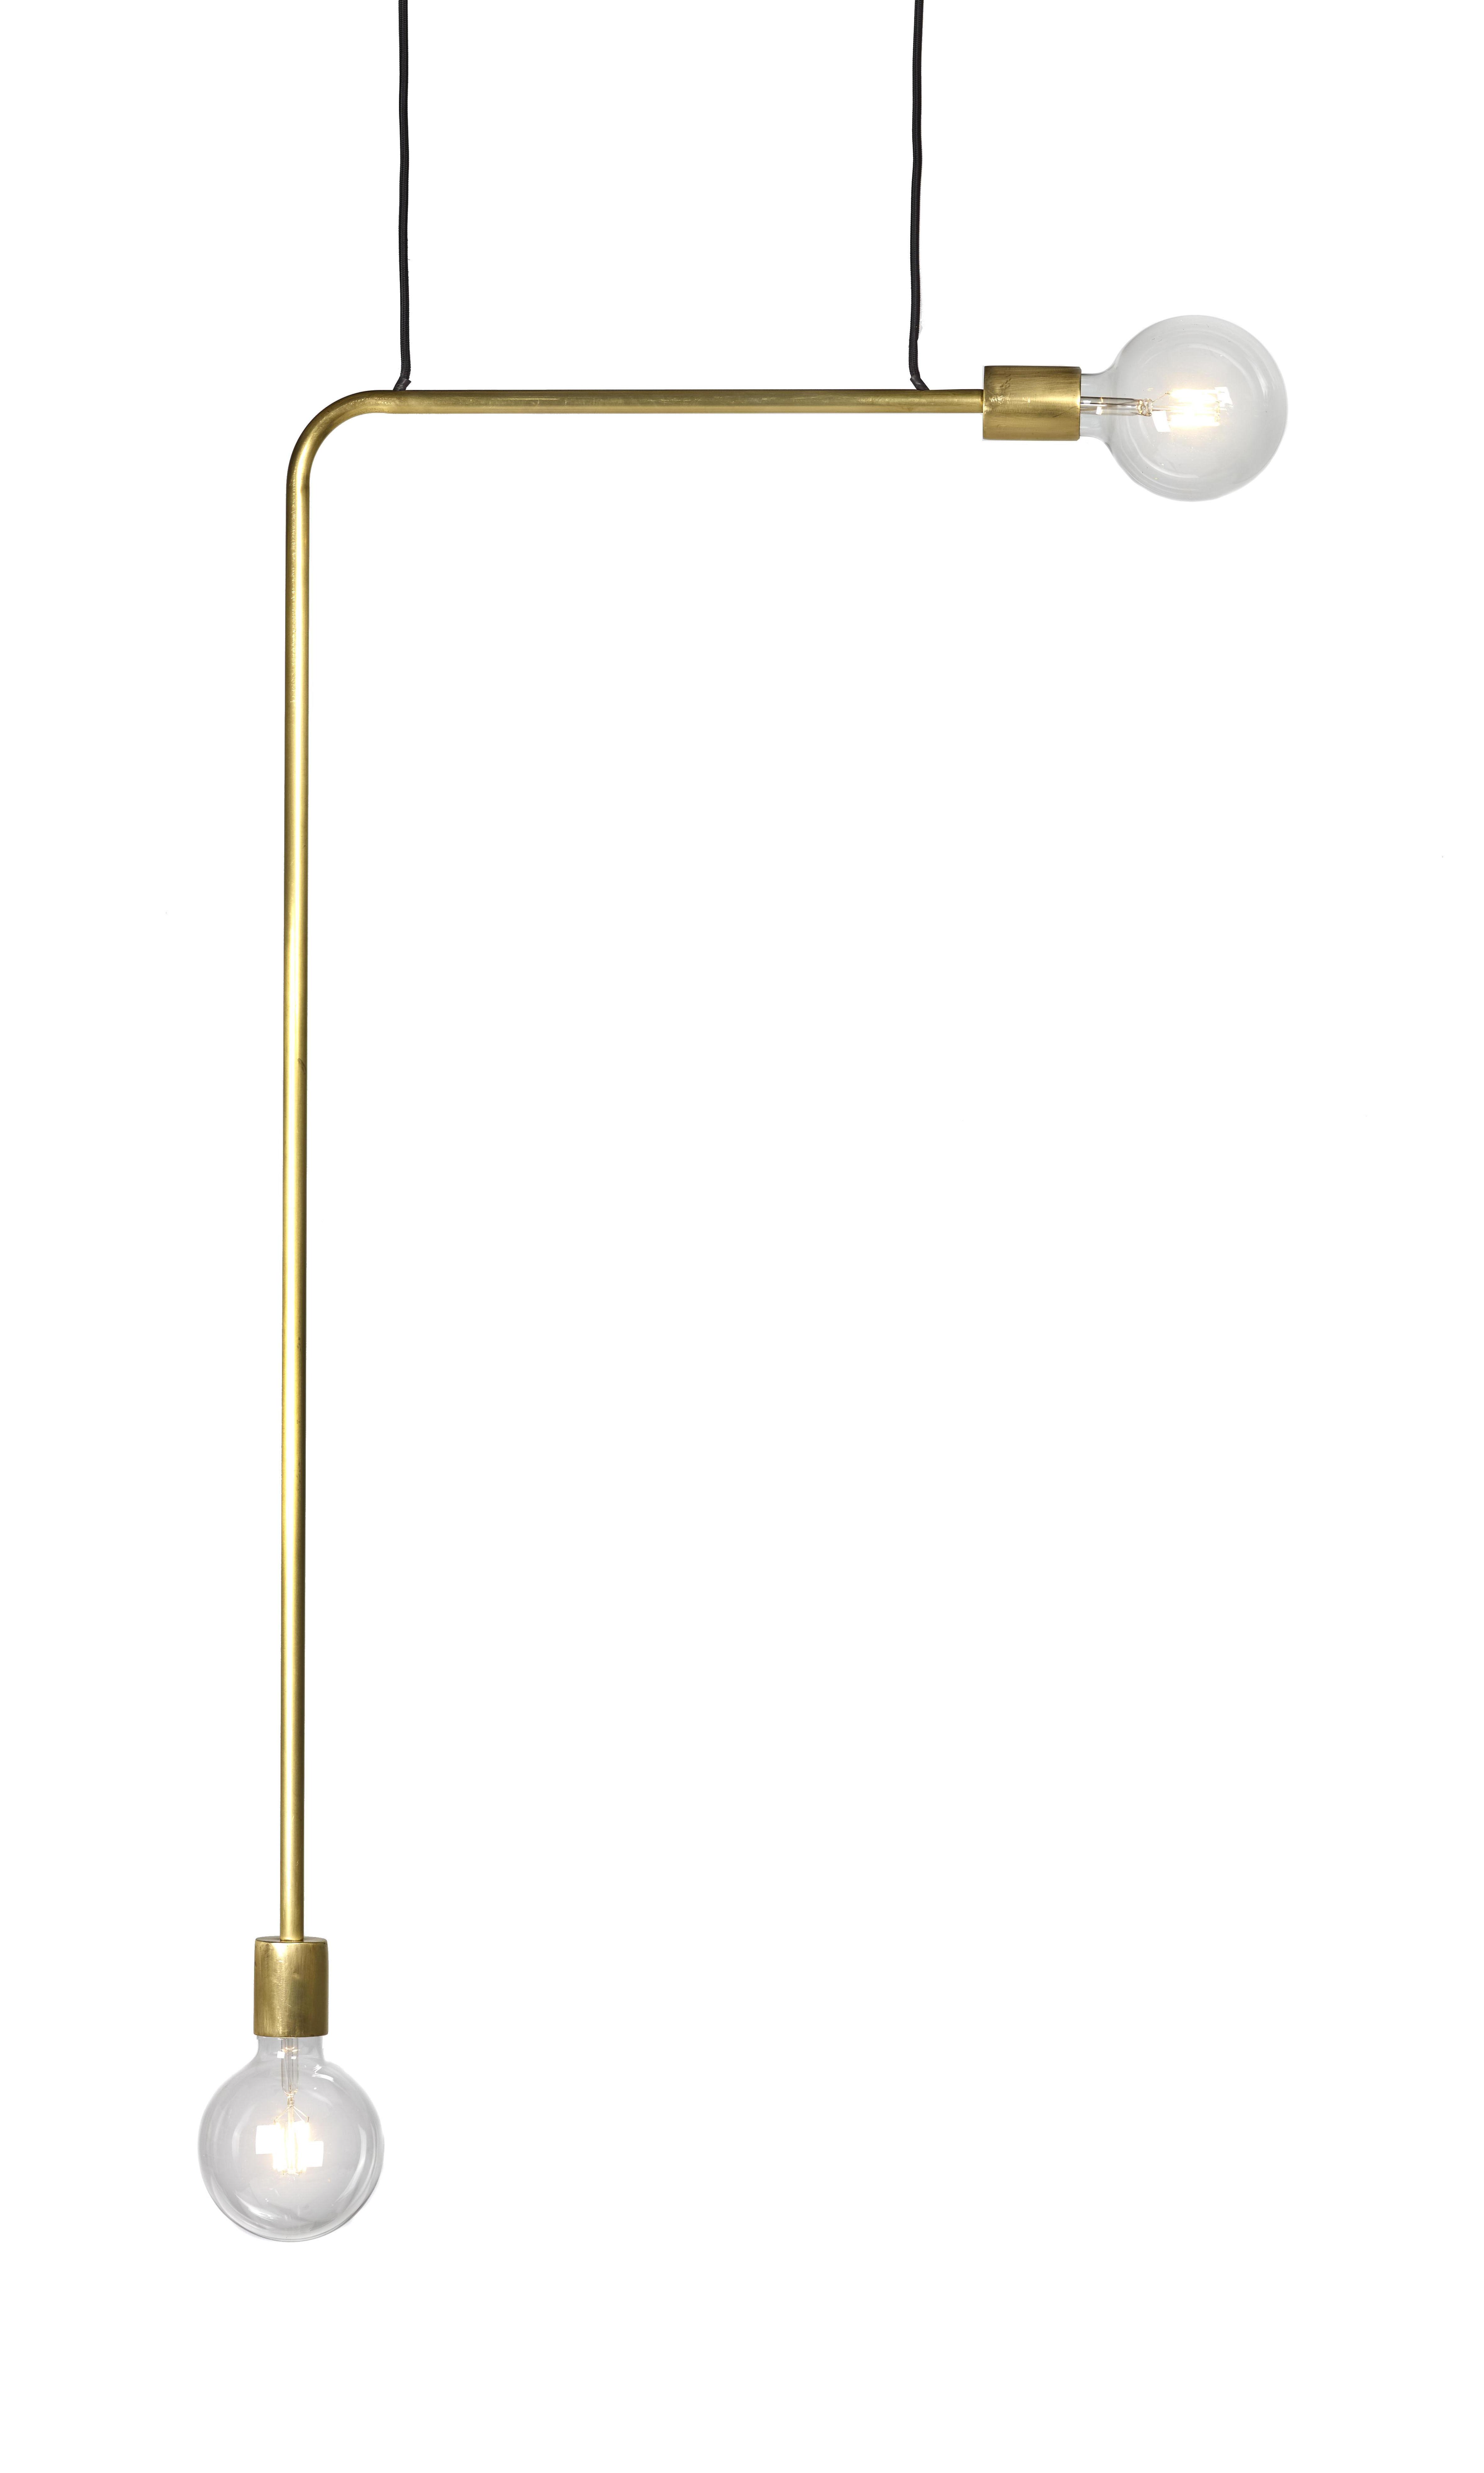 Lighting - Pendant Lighting - Essentials n°18-04 Pendant - / Metal - L 55 x H 144 cm by Serax - Brass - Metal